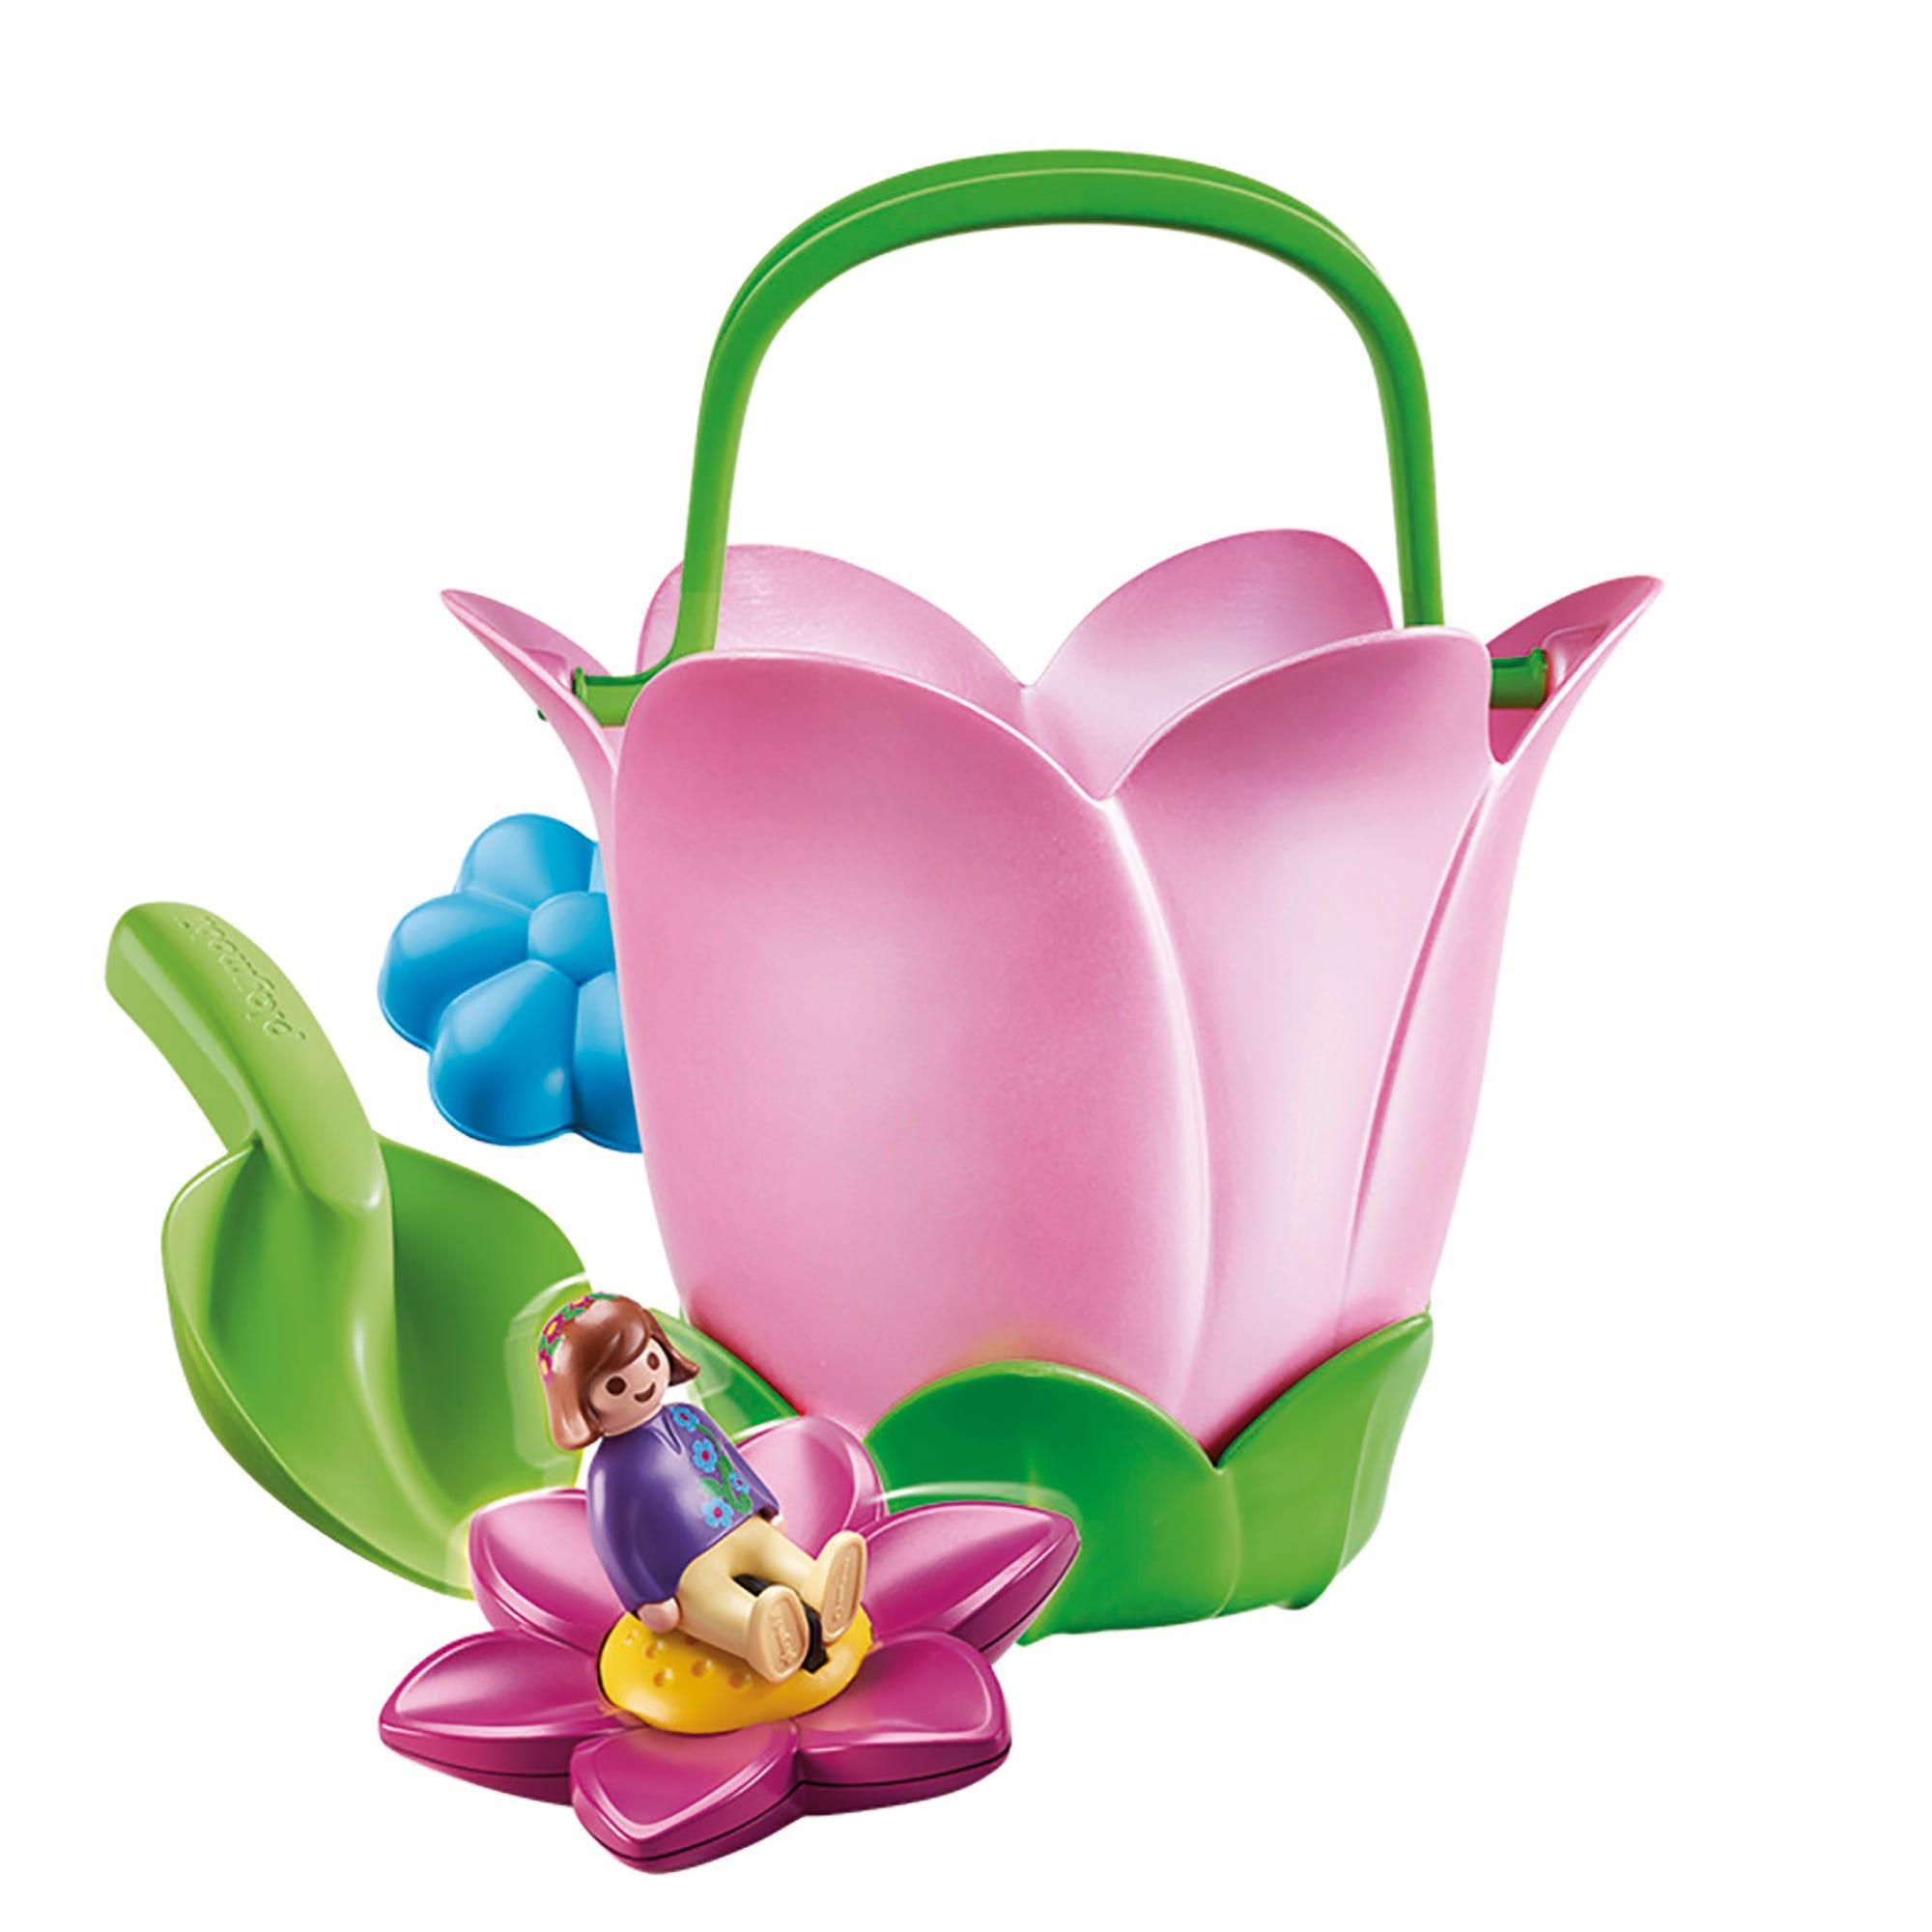 Playmobil 70065 SAND Spring Flower Bucket